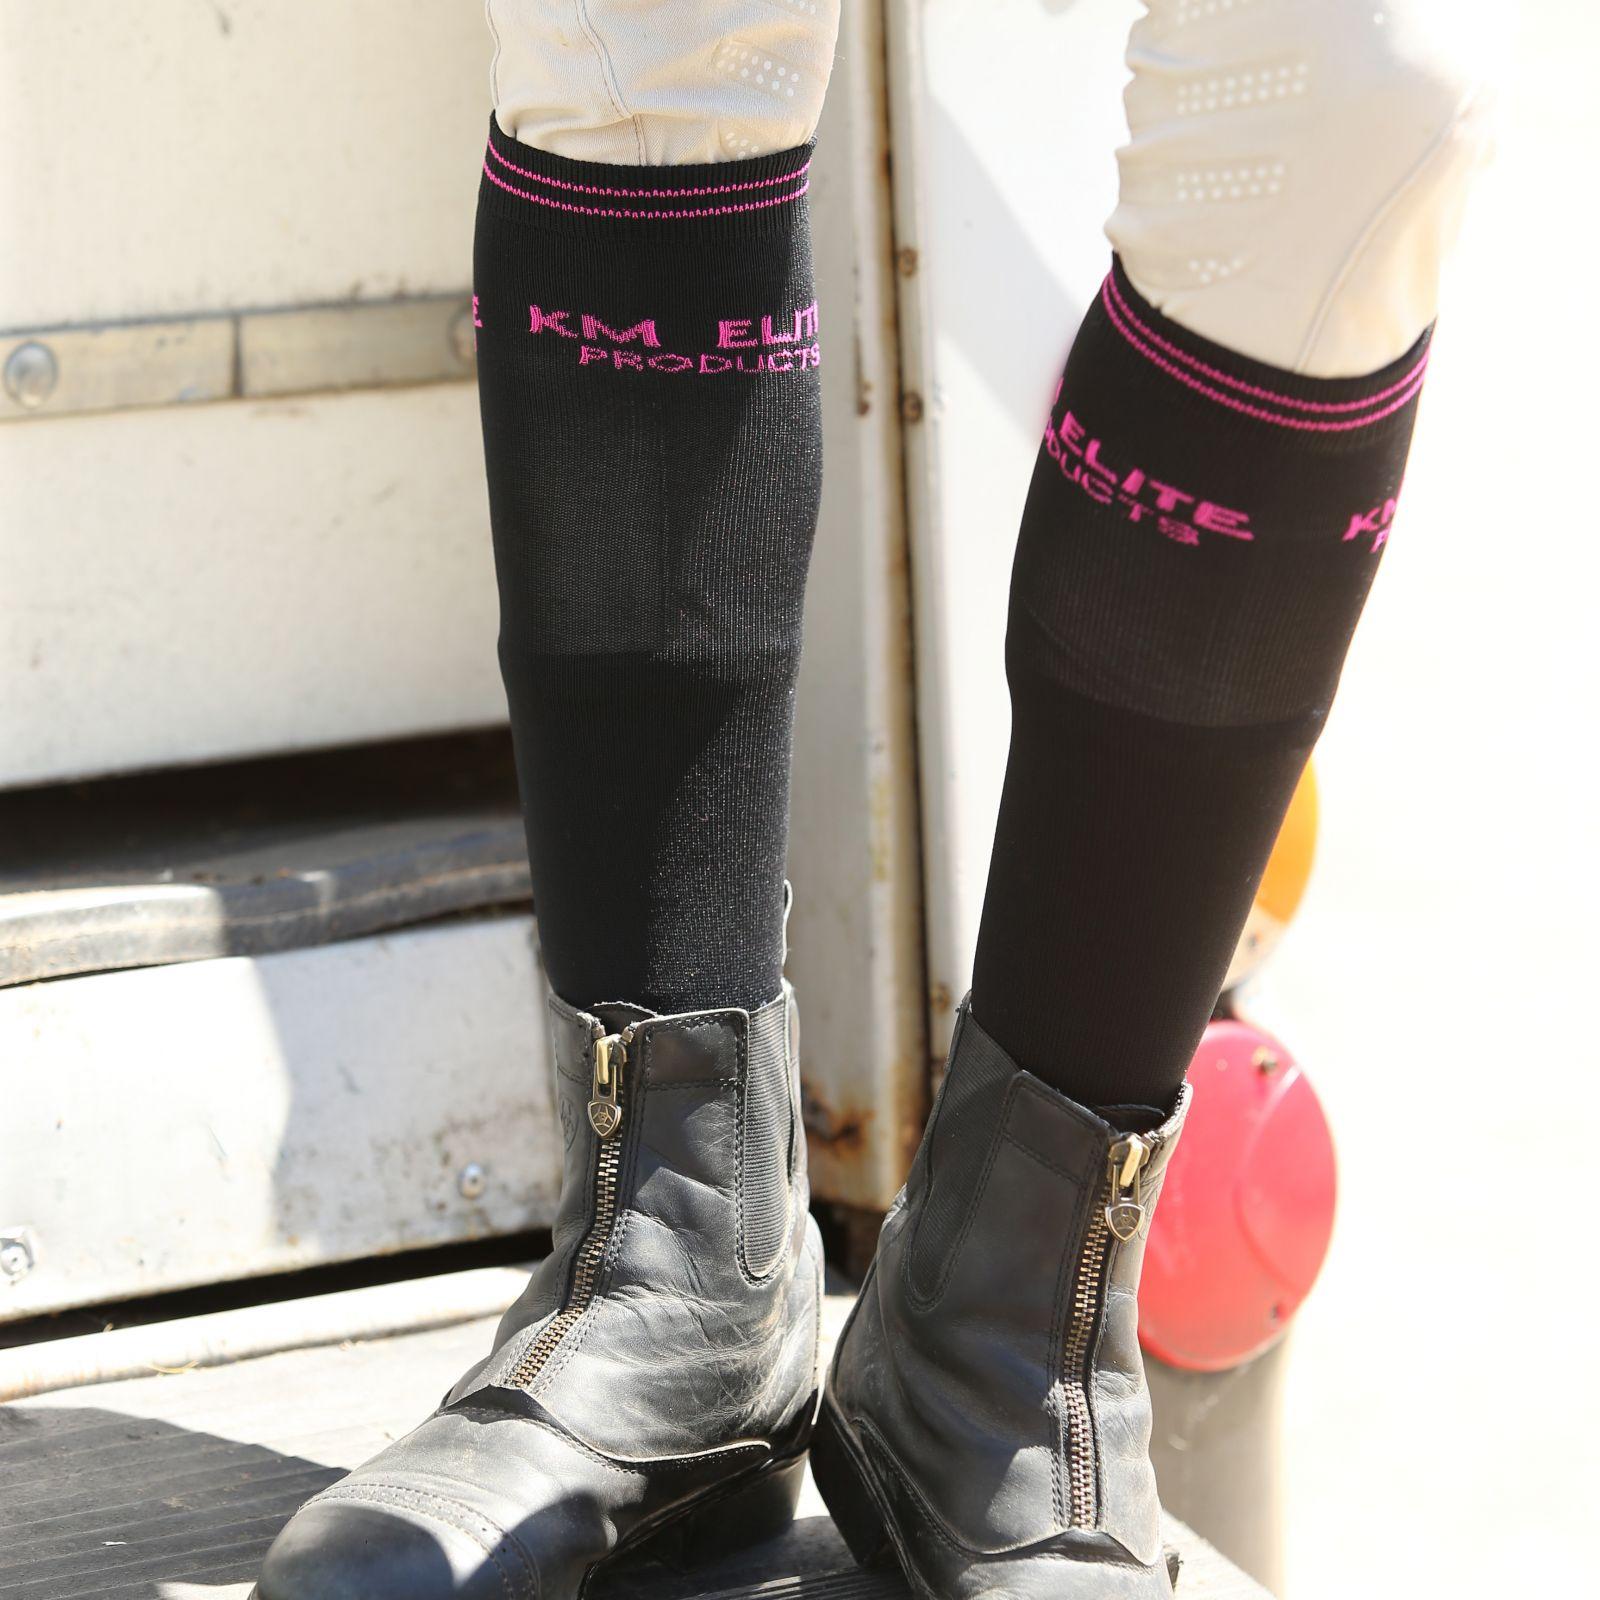 KM Elite Socks Black/Hot Pink